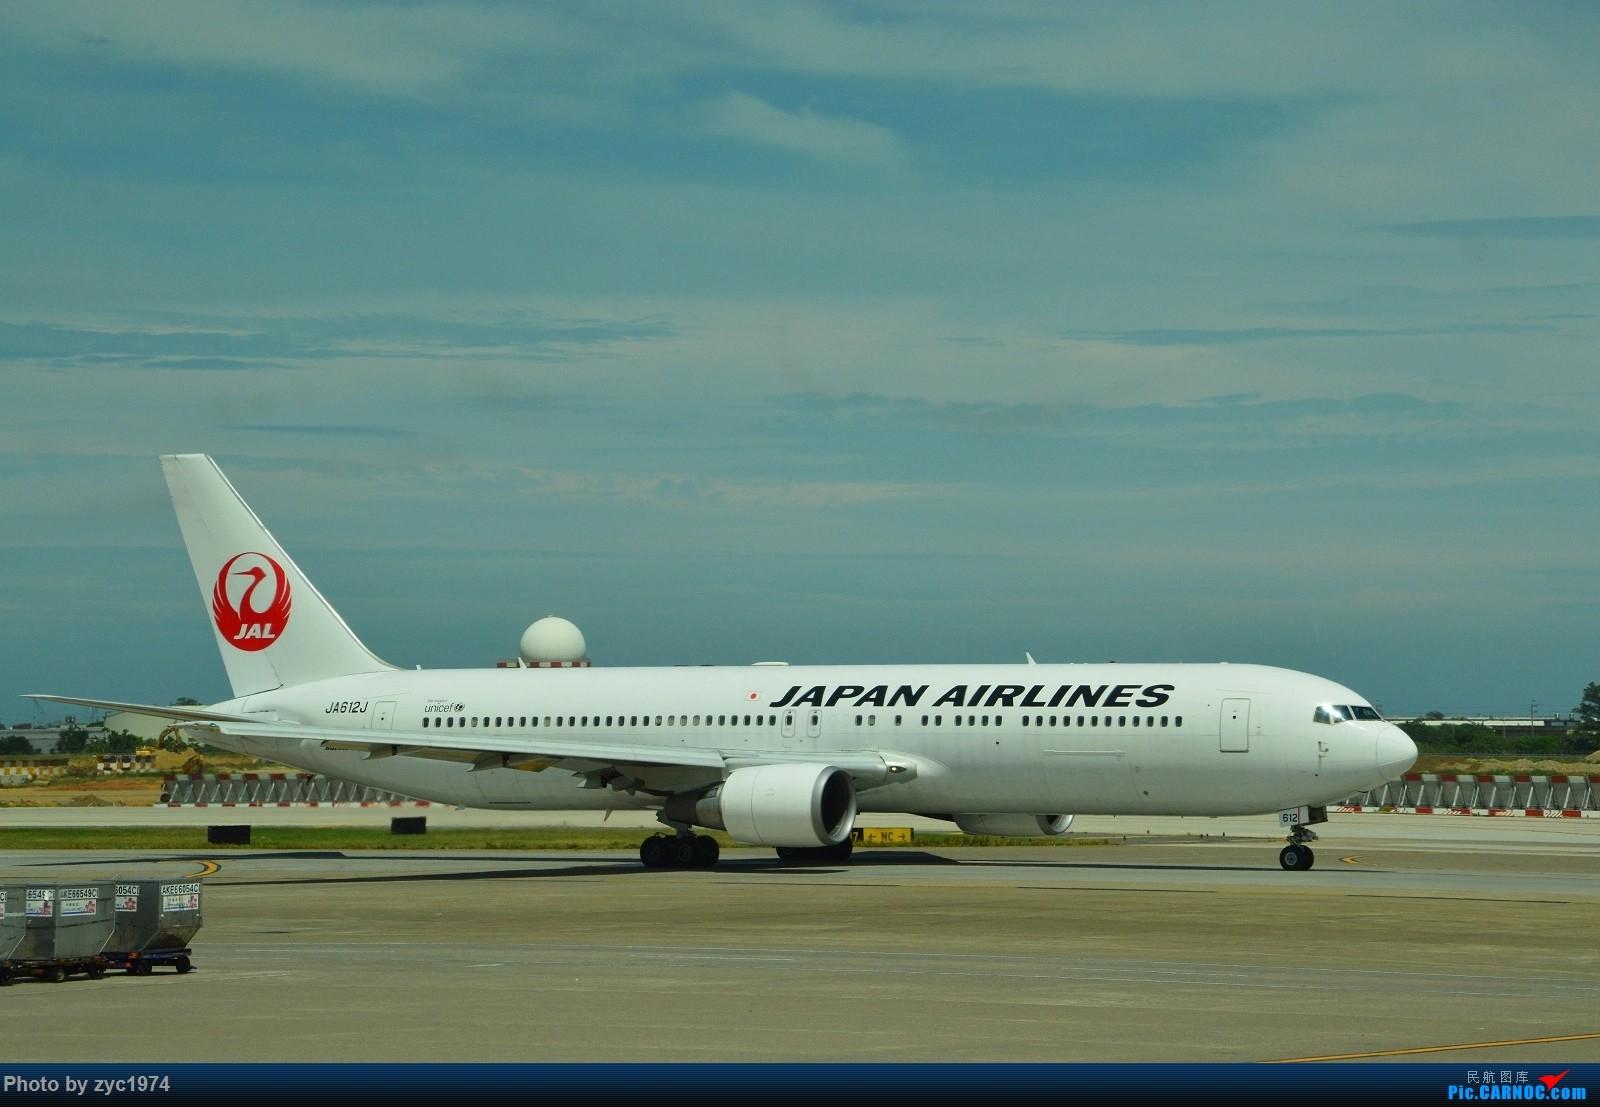 Re:[原创]百年波音—寻找最美波音图片 BOEING 767-300 JA612J 台北桃园国际机场